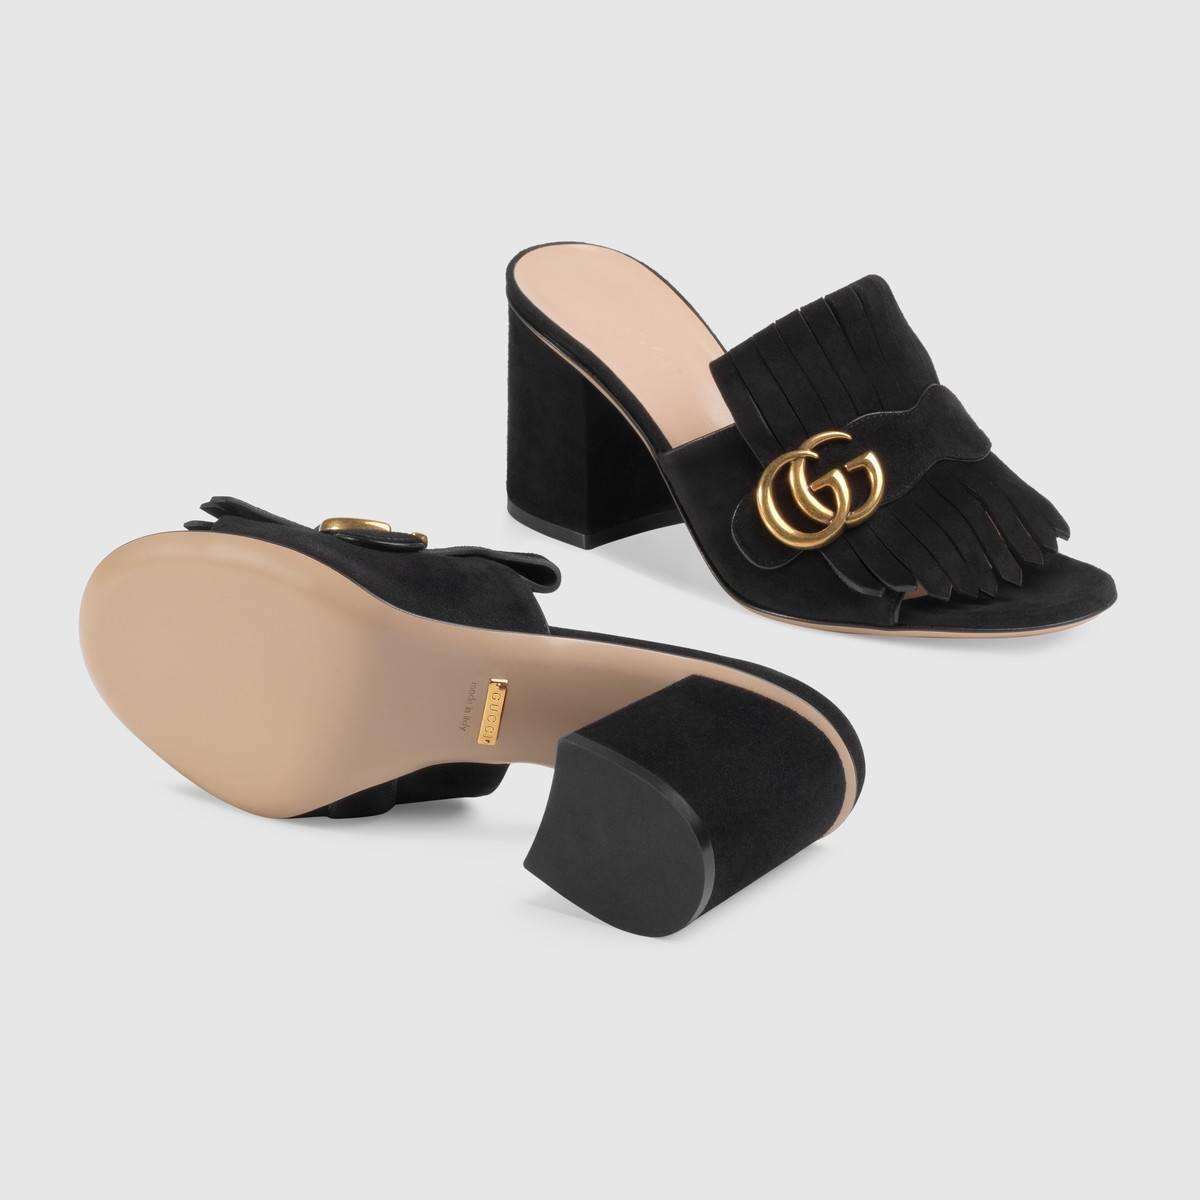 Gucci Mid Heel Slide